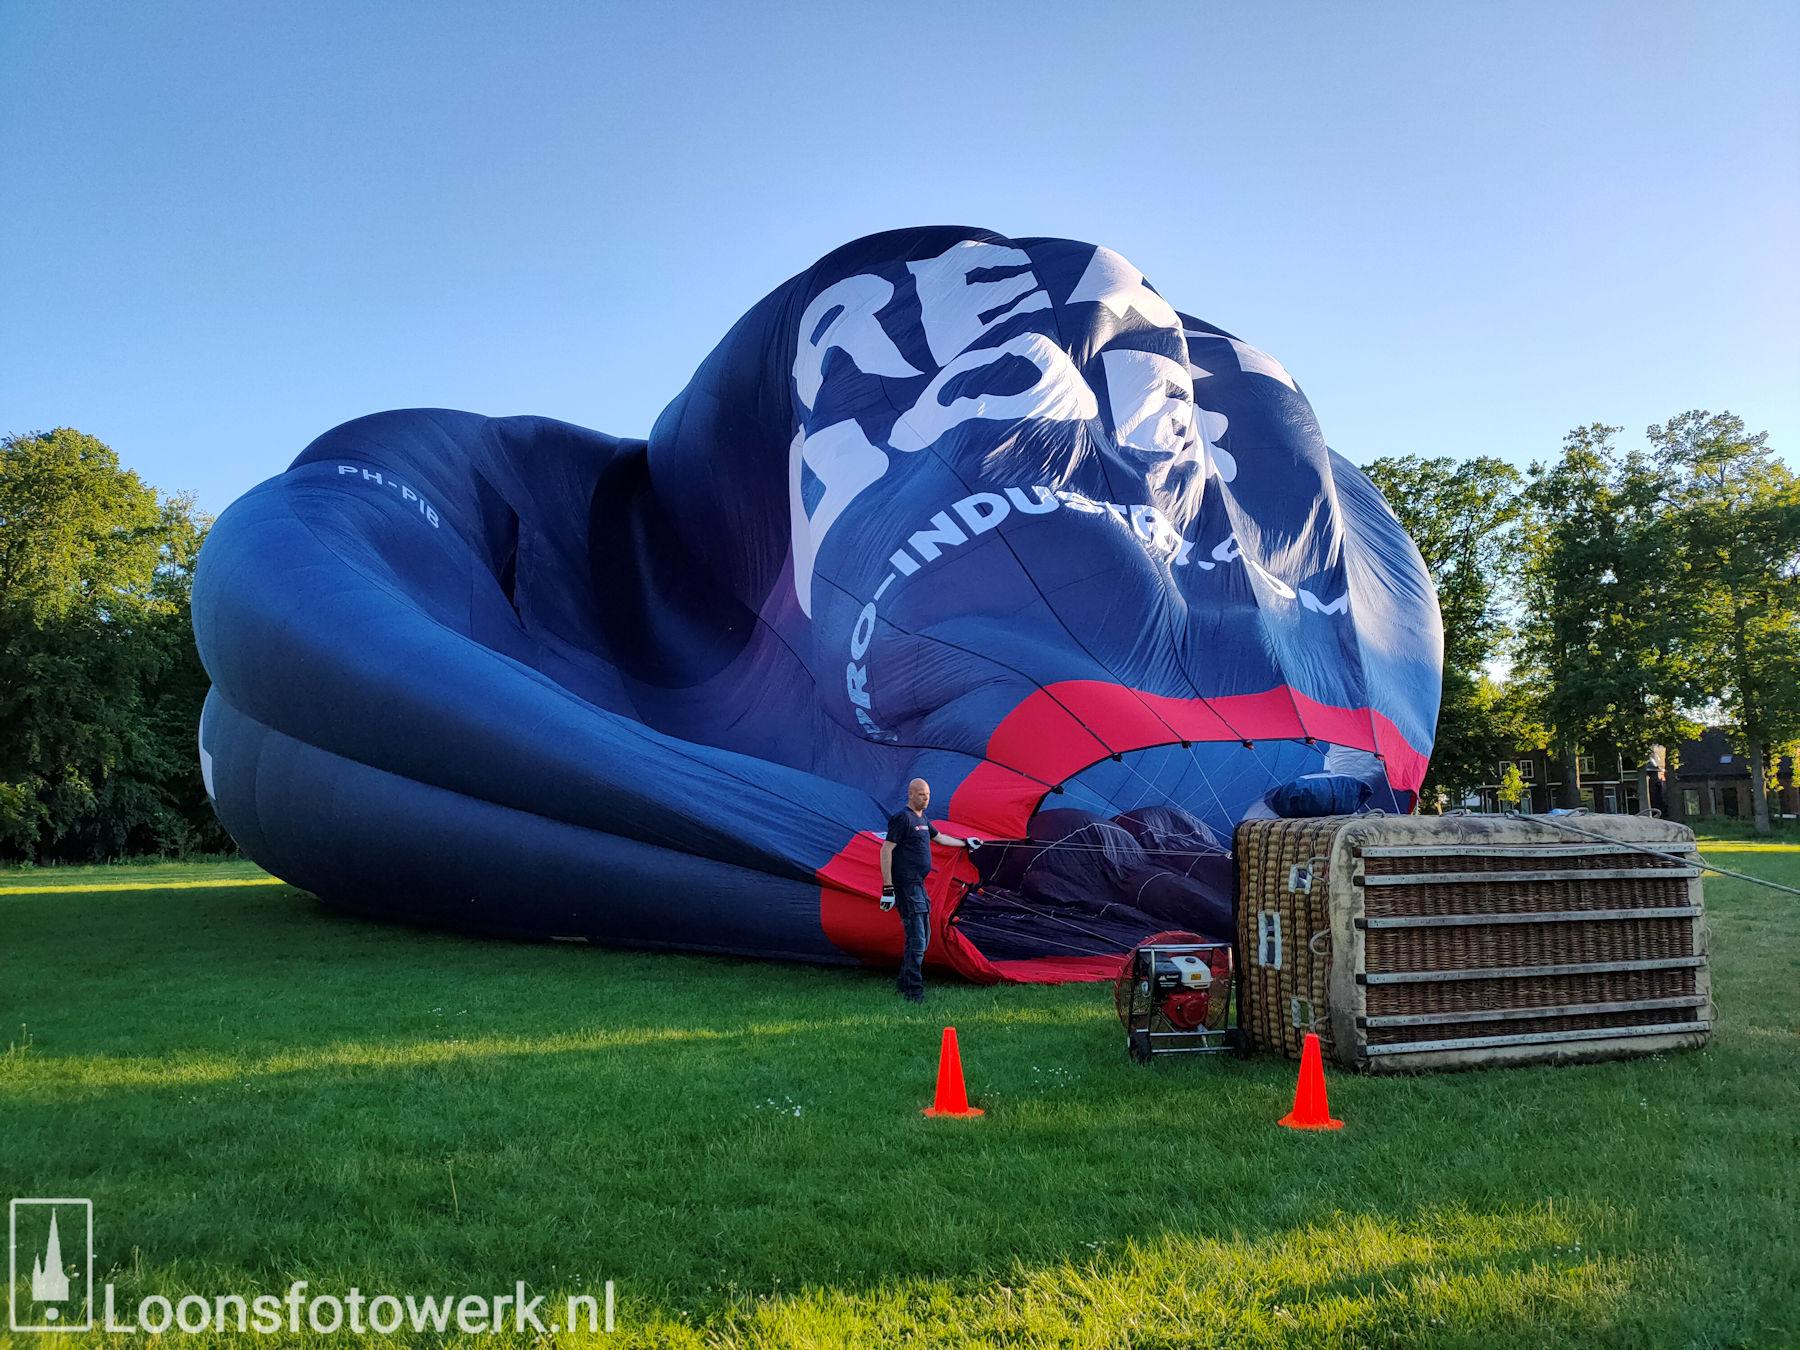 Ballonvaart vanaf de Kasteelweide 2